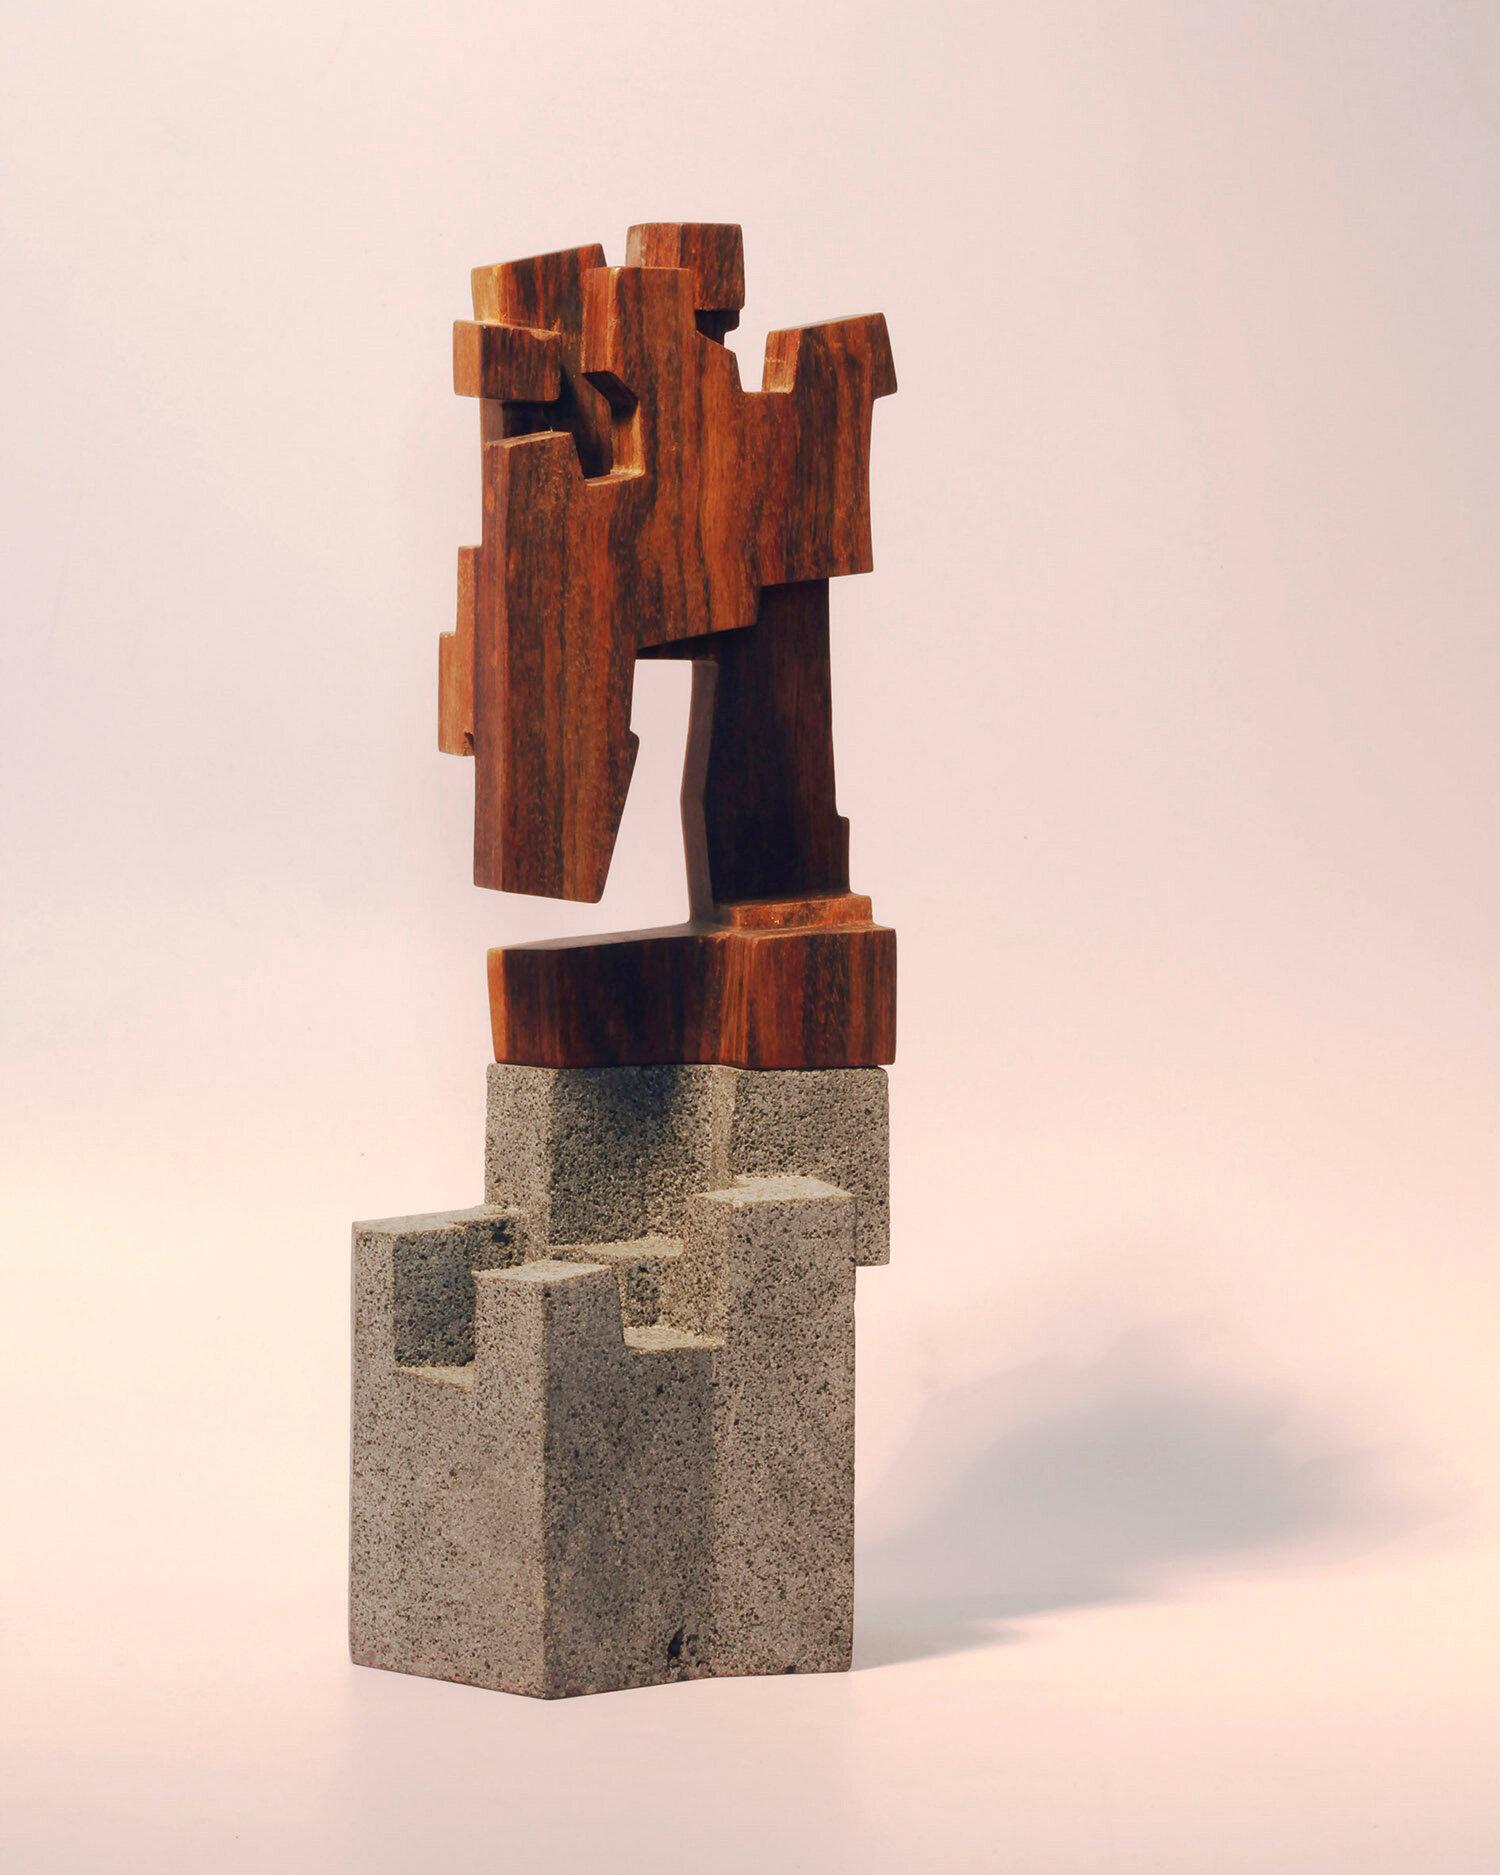 web-untitled-Jorge-Yazpik-sculpture-wood-volcanic-stone-3-MarionFriedmannGallery-lr.jpg